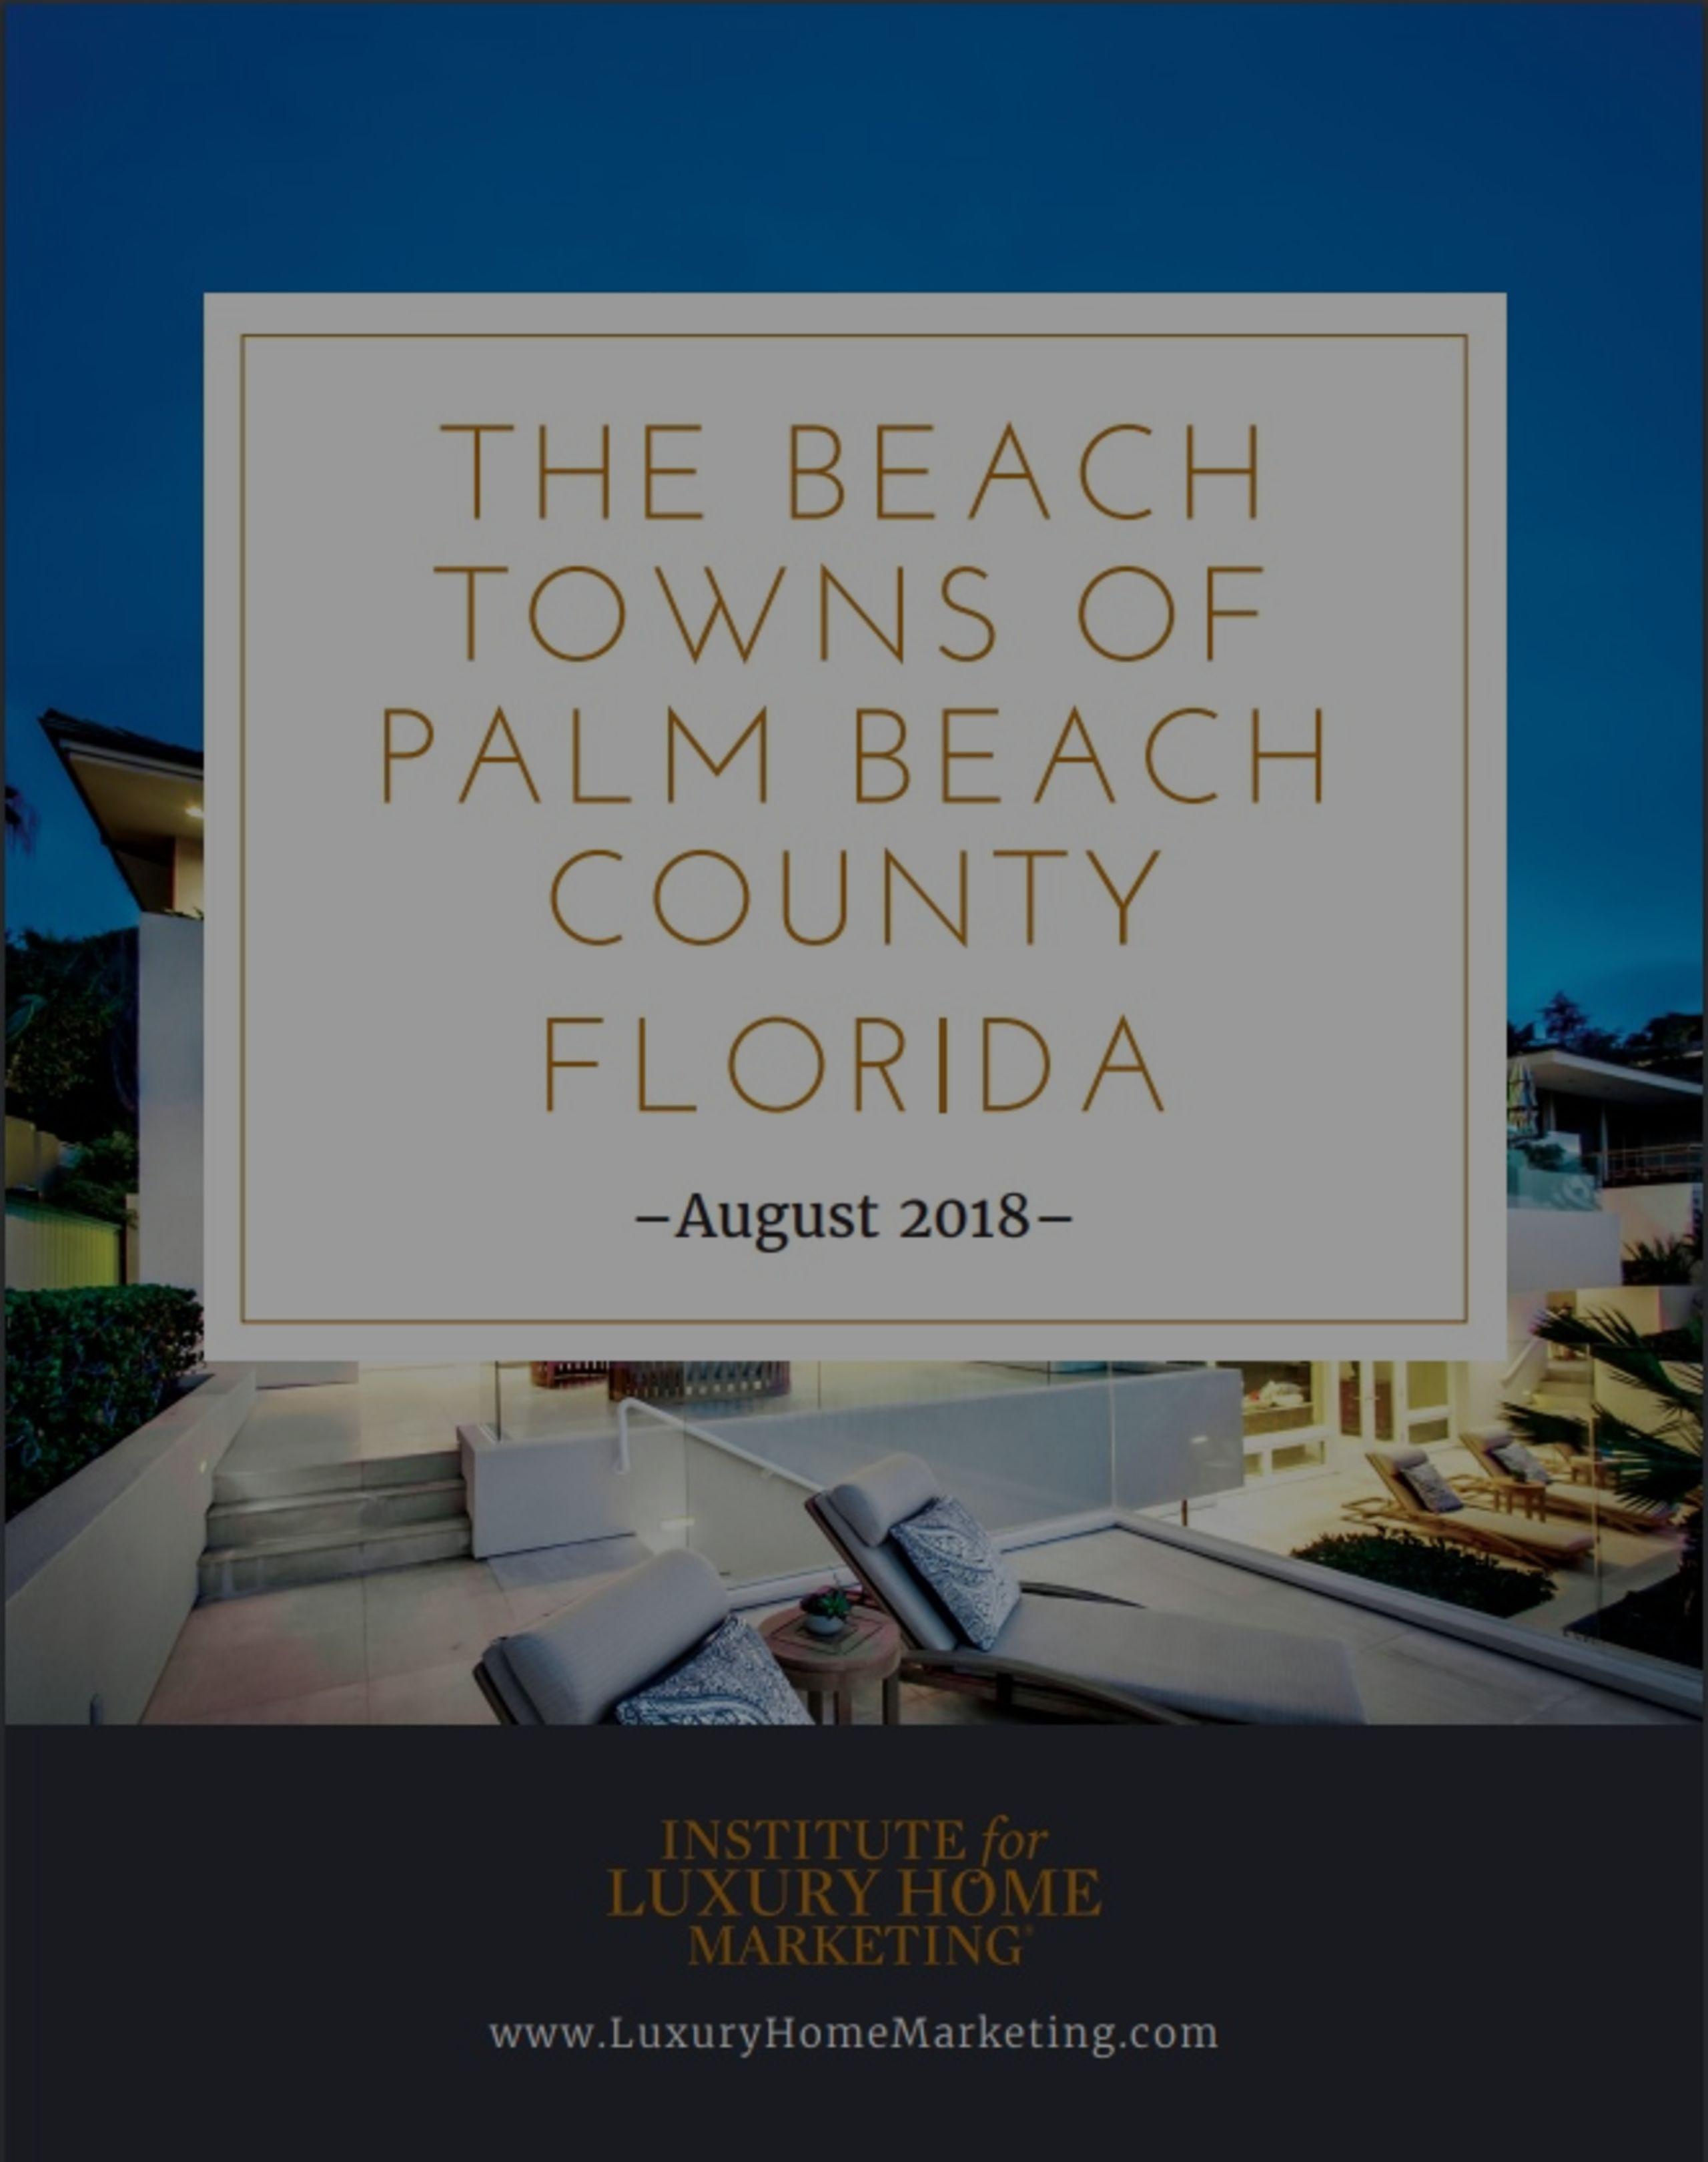 LUXURY MARKET BEACH TOWNS OF THE PALM BEACHES 2018